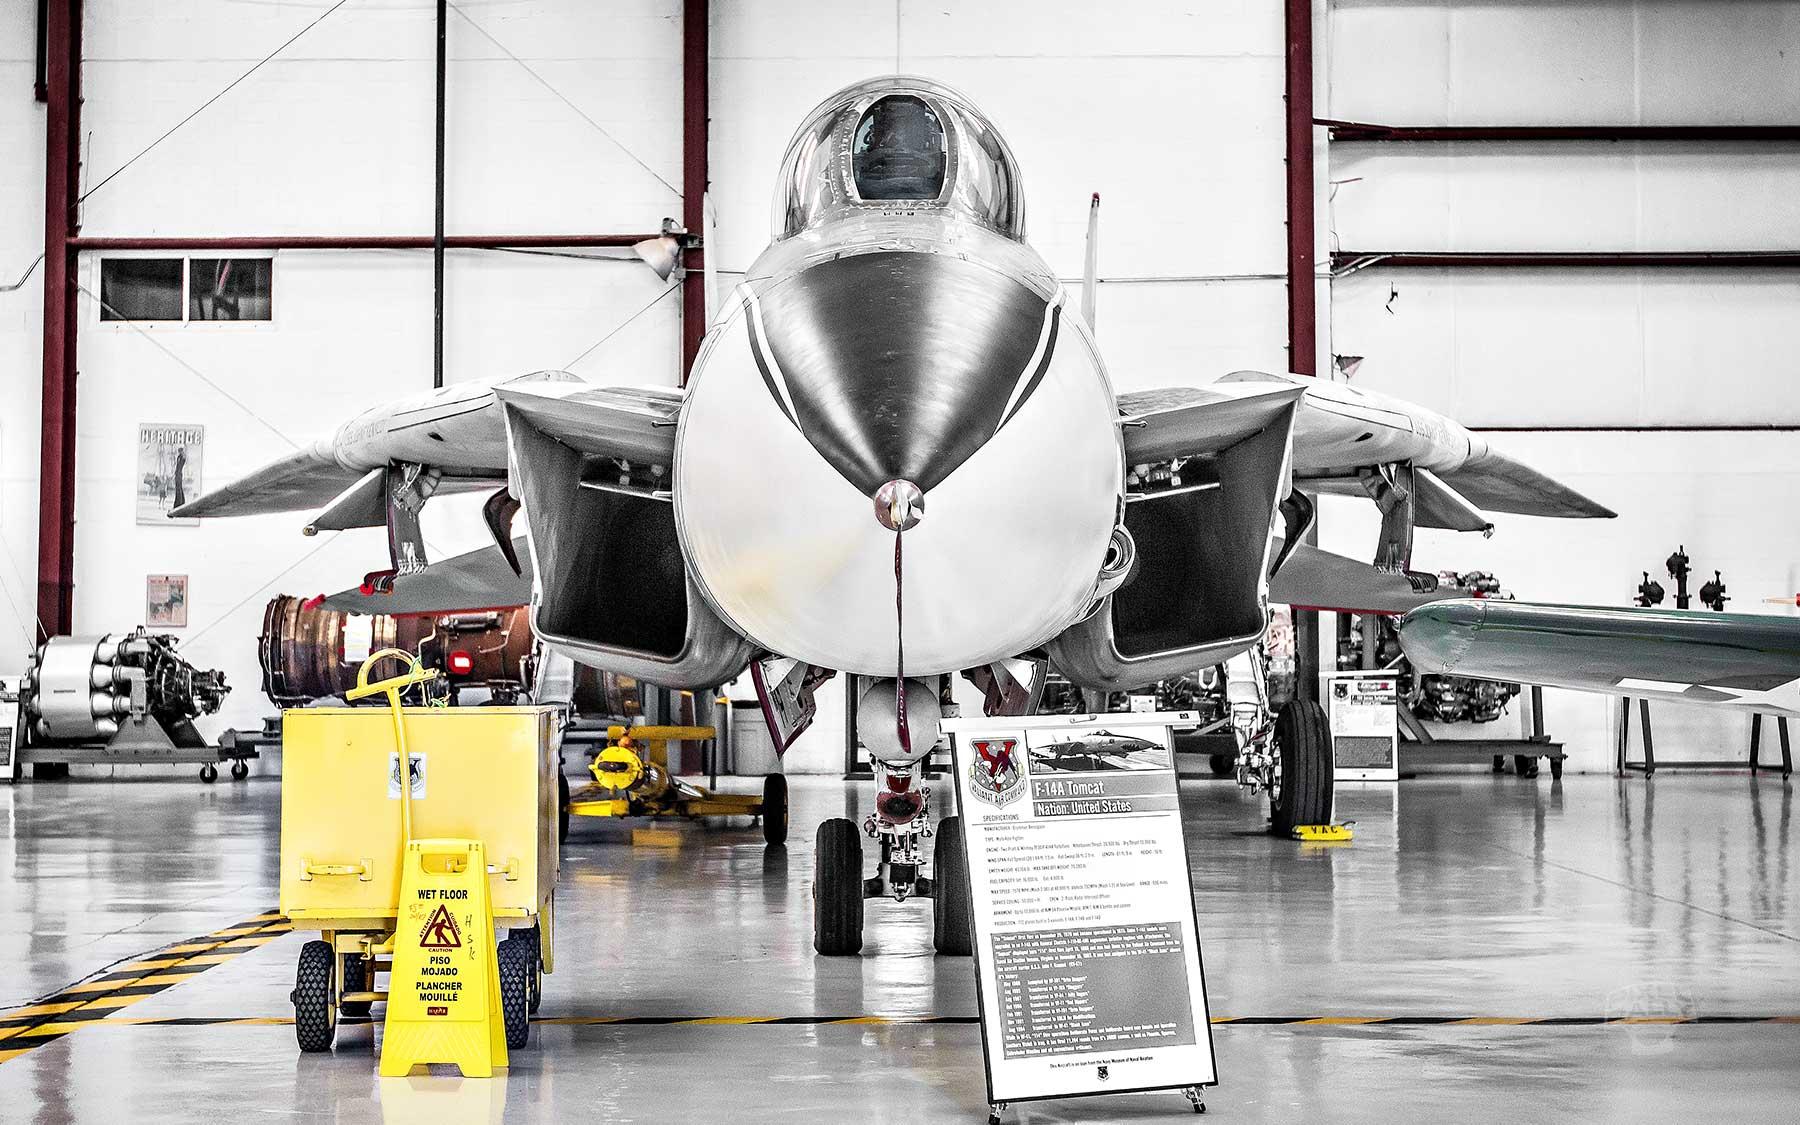 FL-WarbirdsMuseum-F14A-tomcat-face